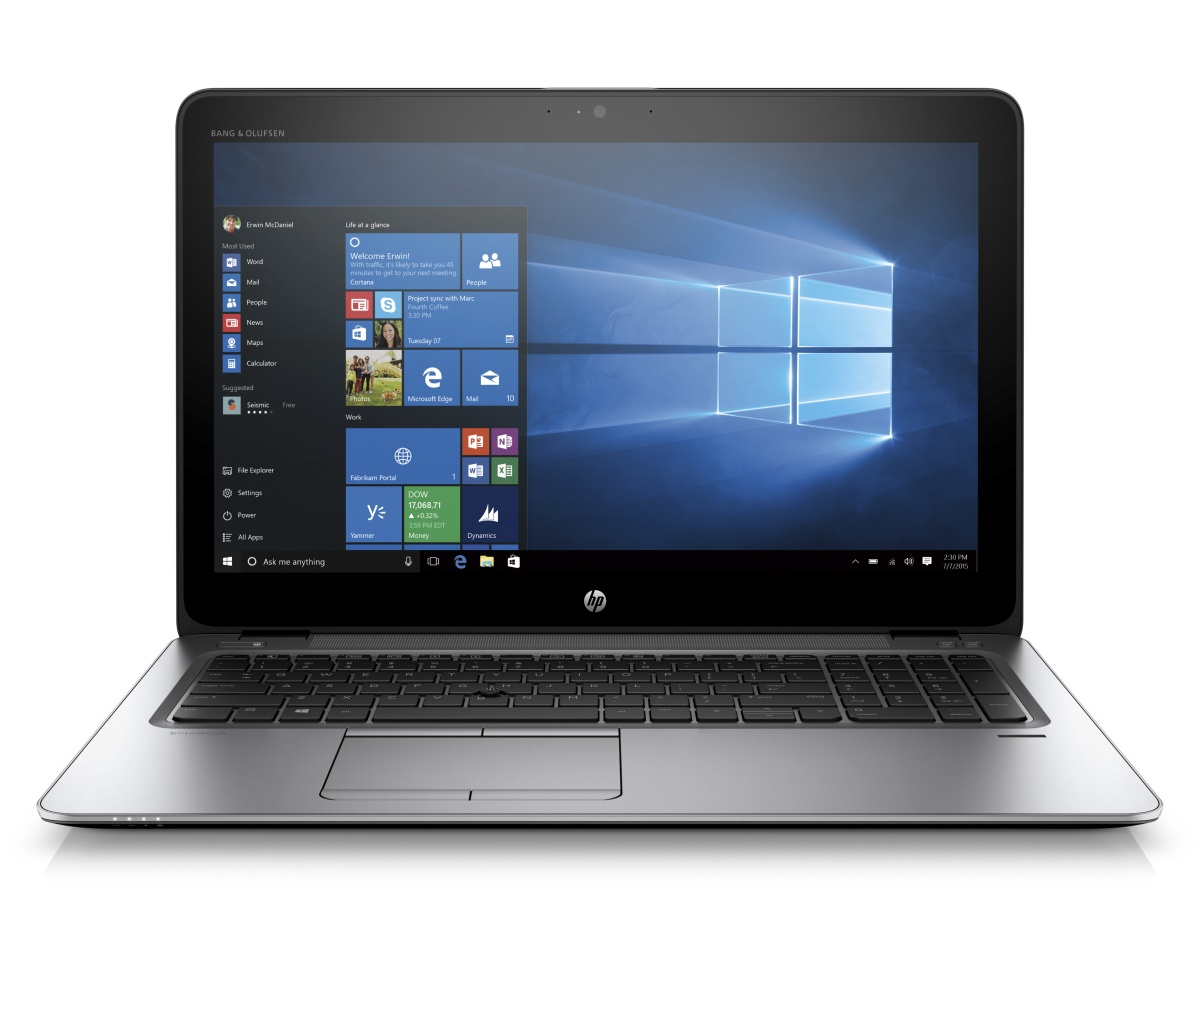 "HP EliteBook 850 G3 15.6"" FHD /i7-6500U/8GB/256SSD/WIFI/BT/MCR/FPR/3RServis/7+10P"